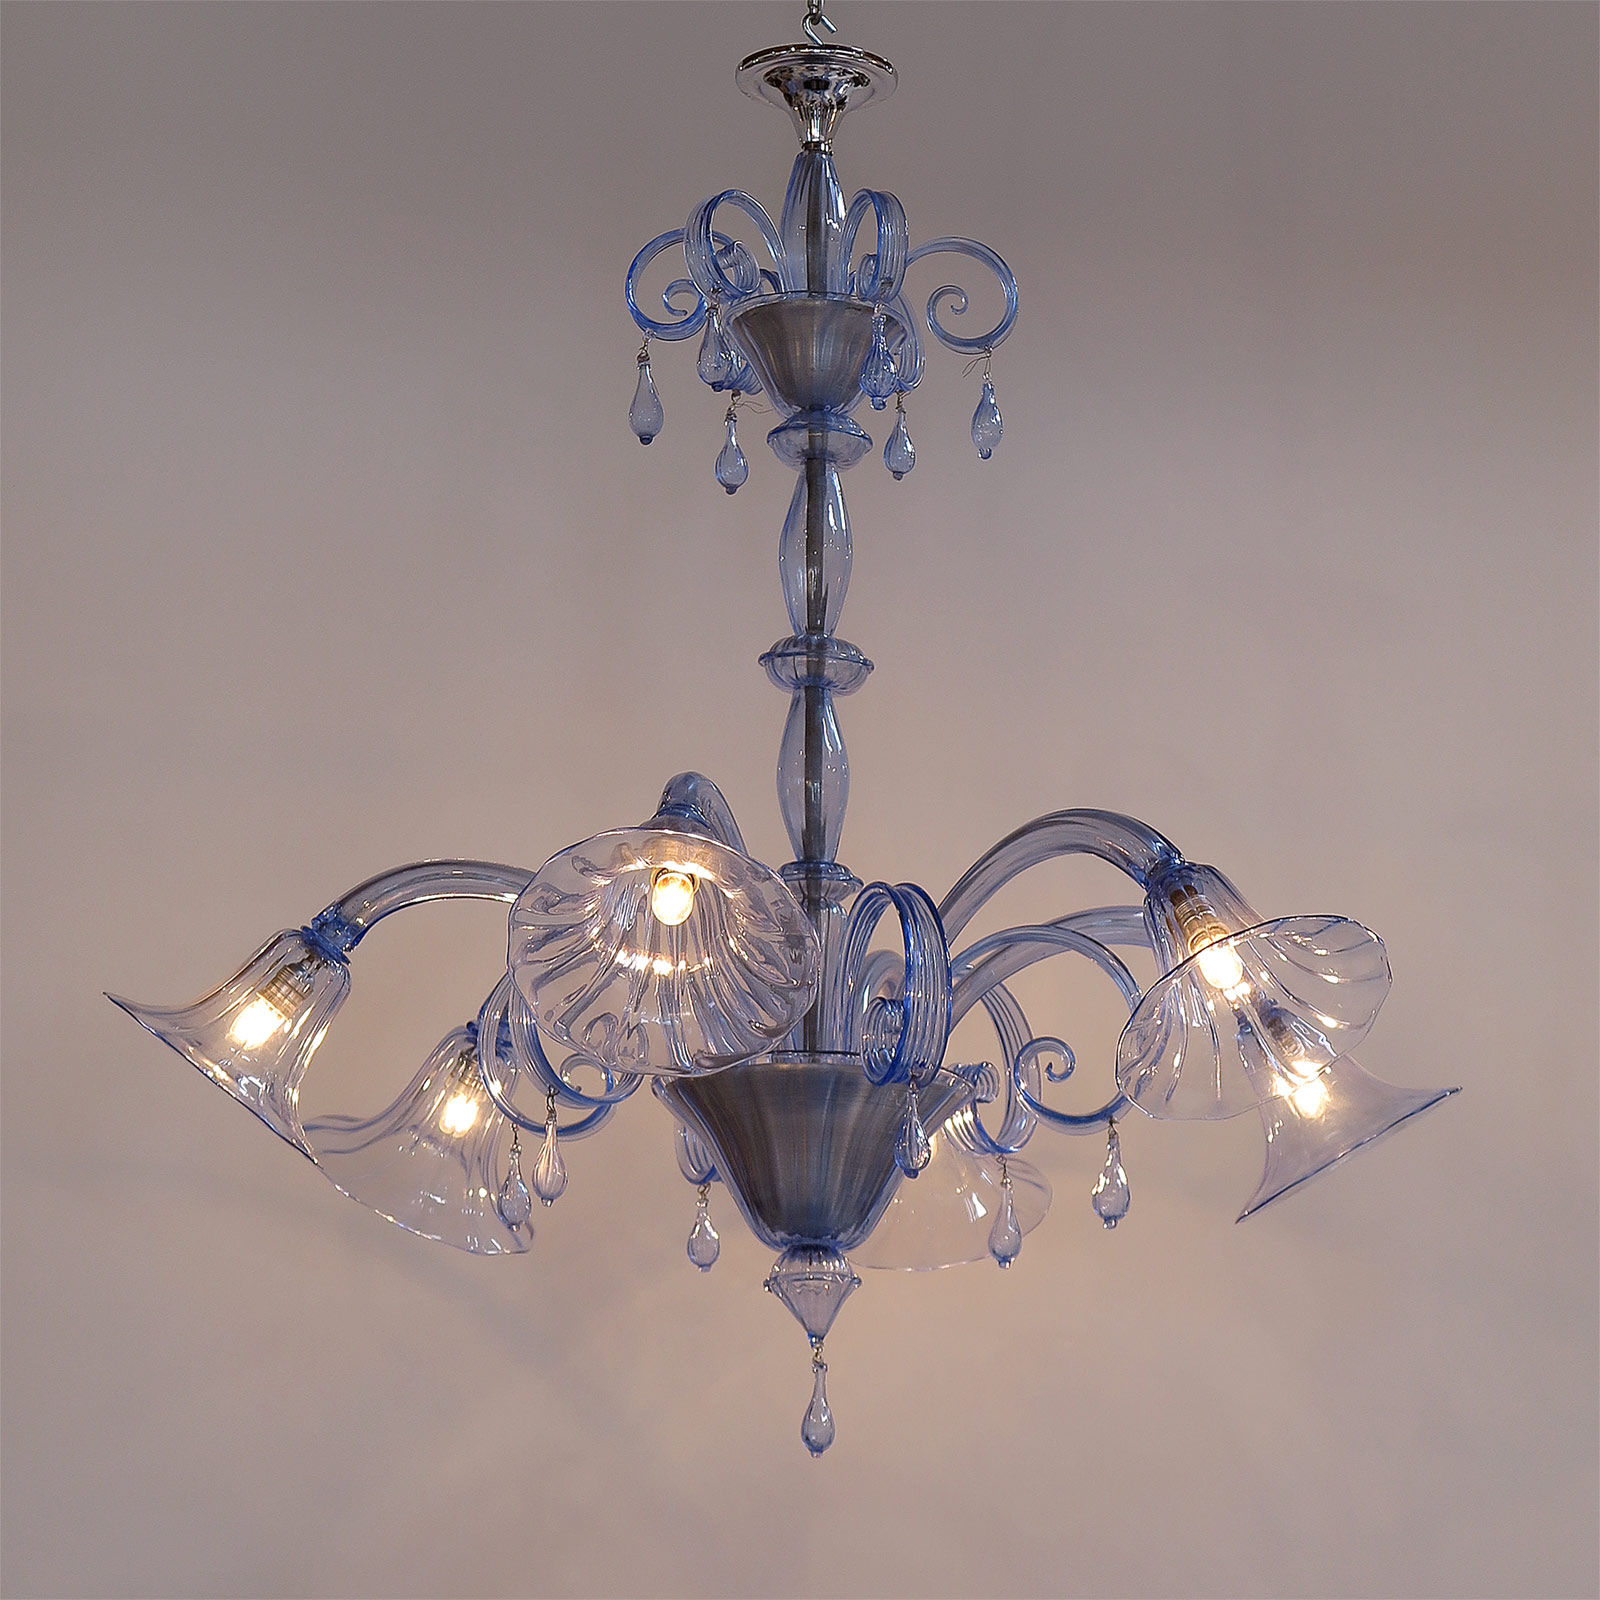 Chandelier by venini nicholas alistair chandelier by venini arubaitofo Gallery